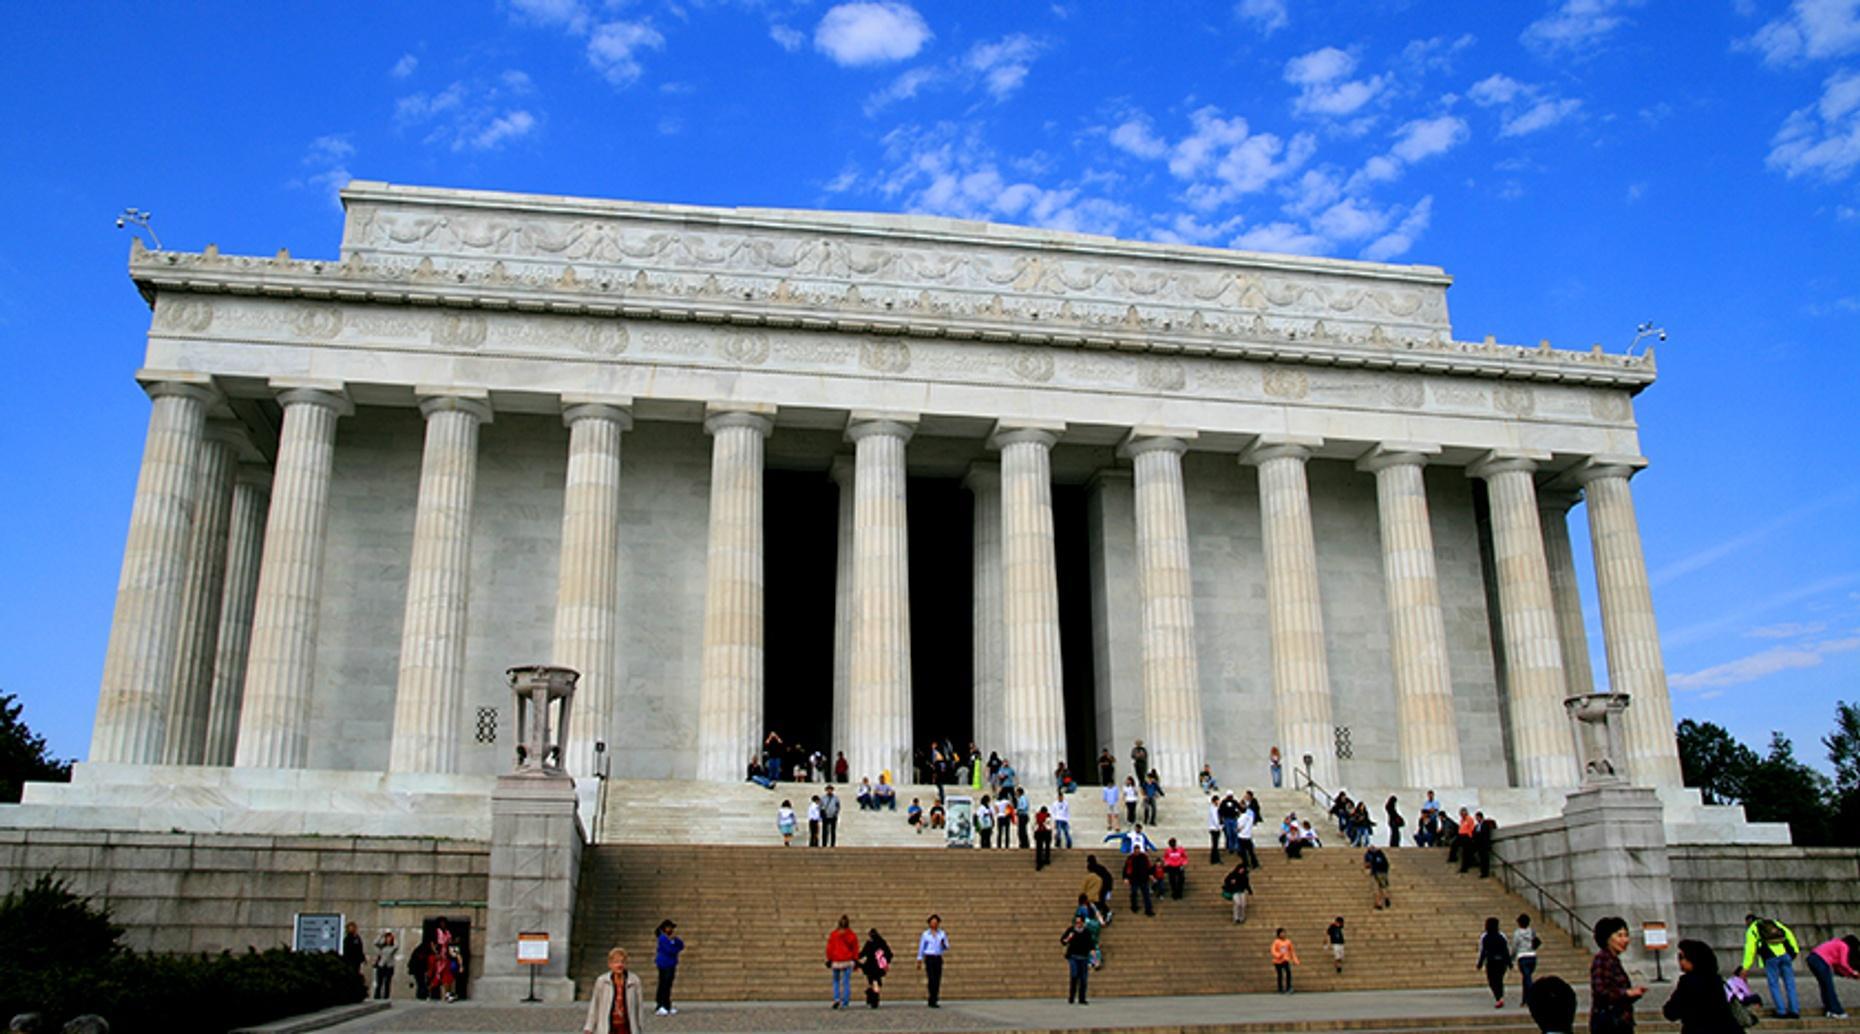 Half-Day Tour of Washington D.C.